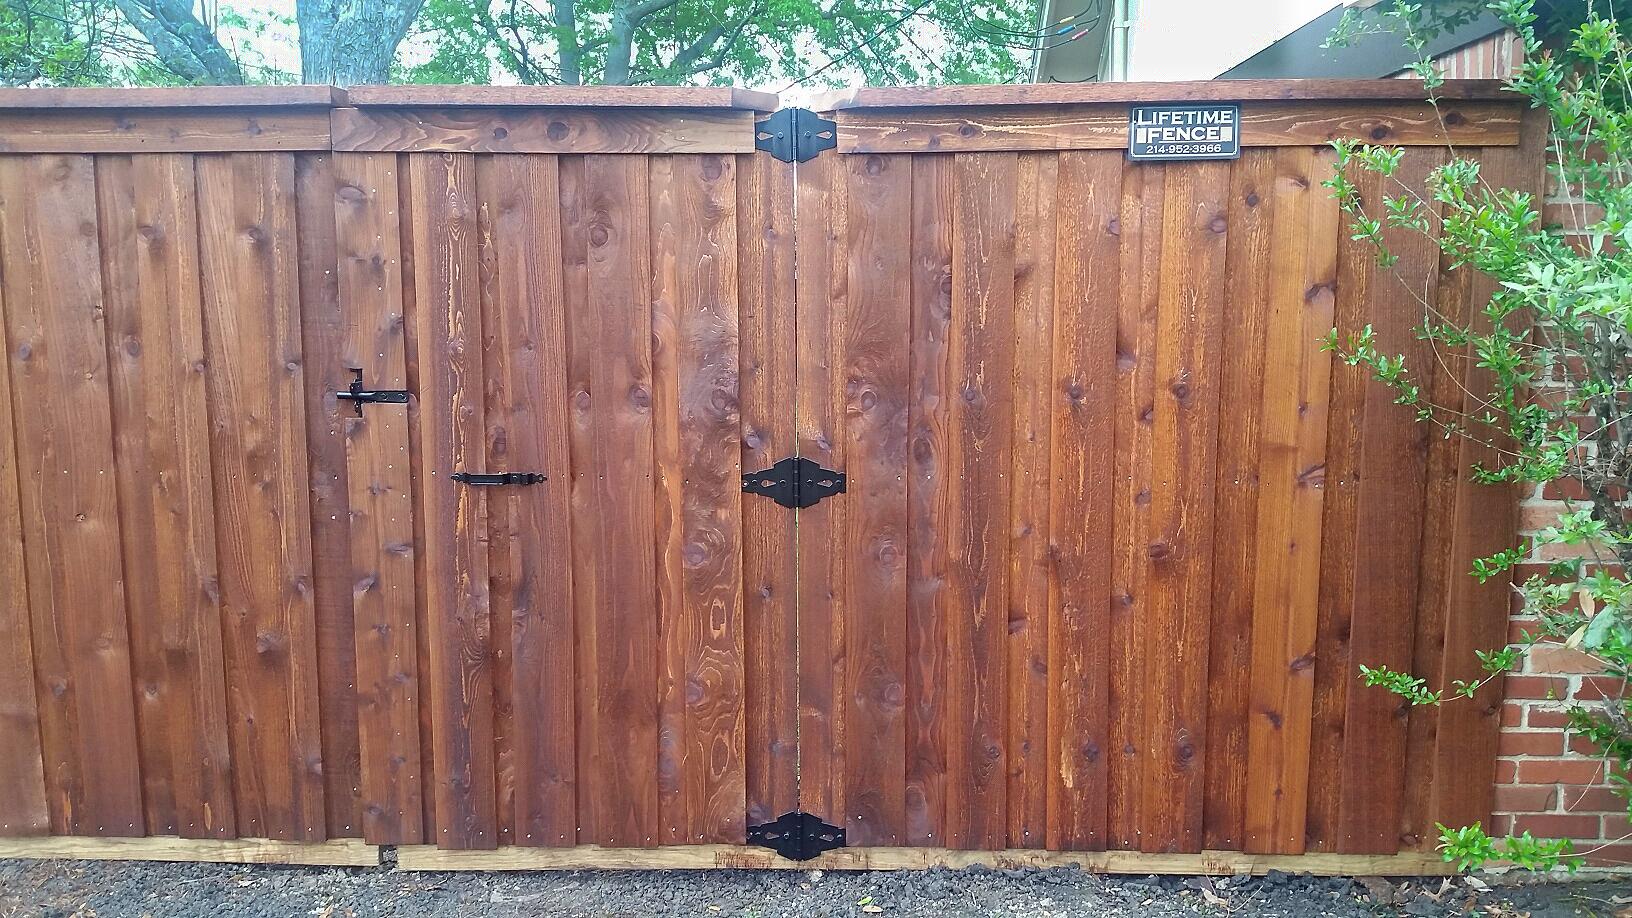 6 Ft Board On Board Gate Cap Fence Companies Gate